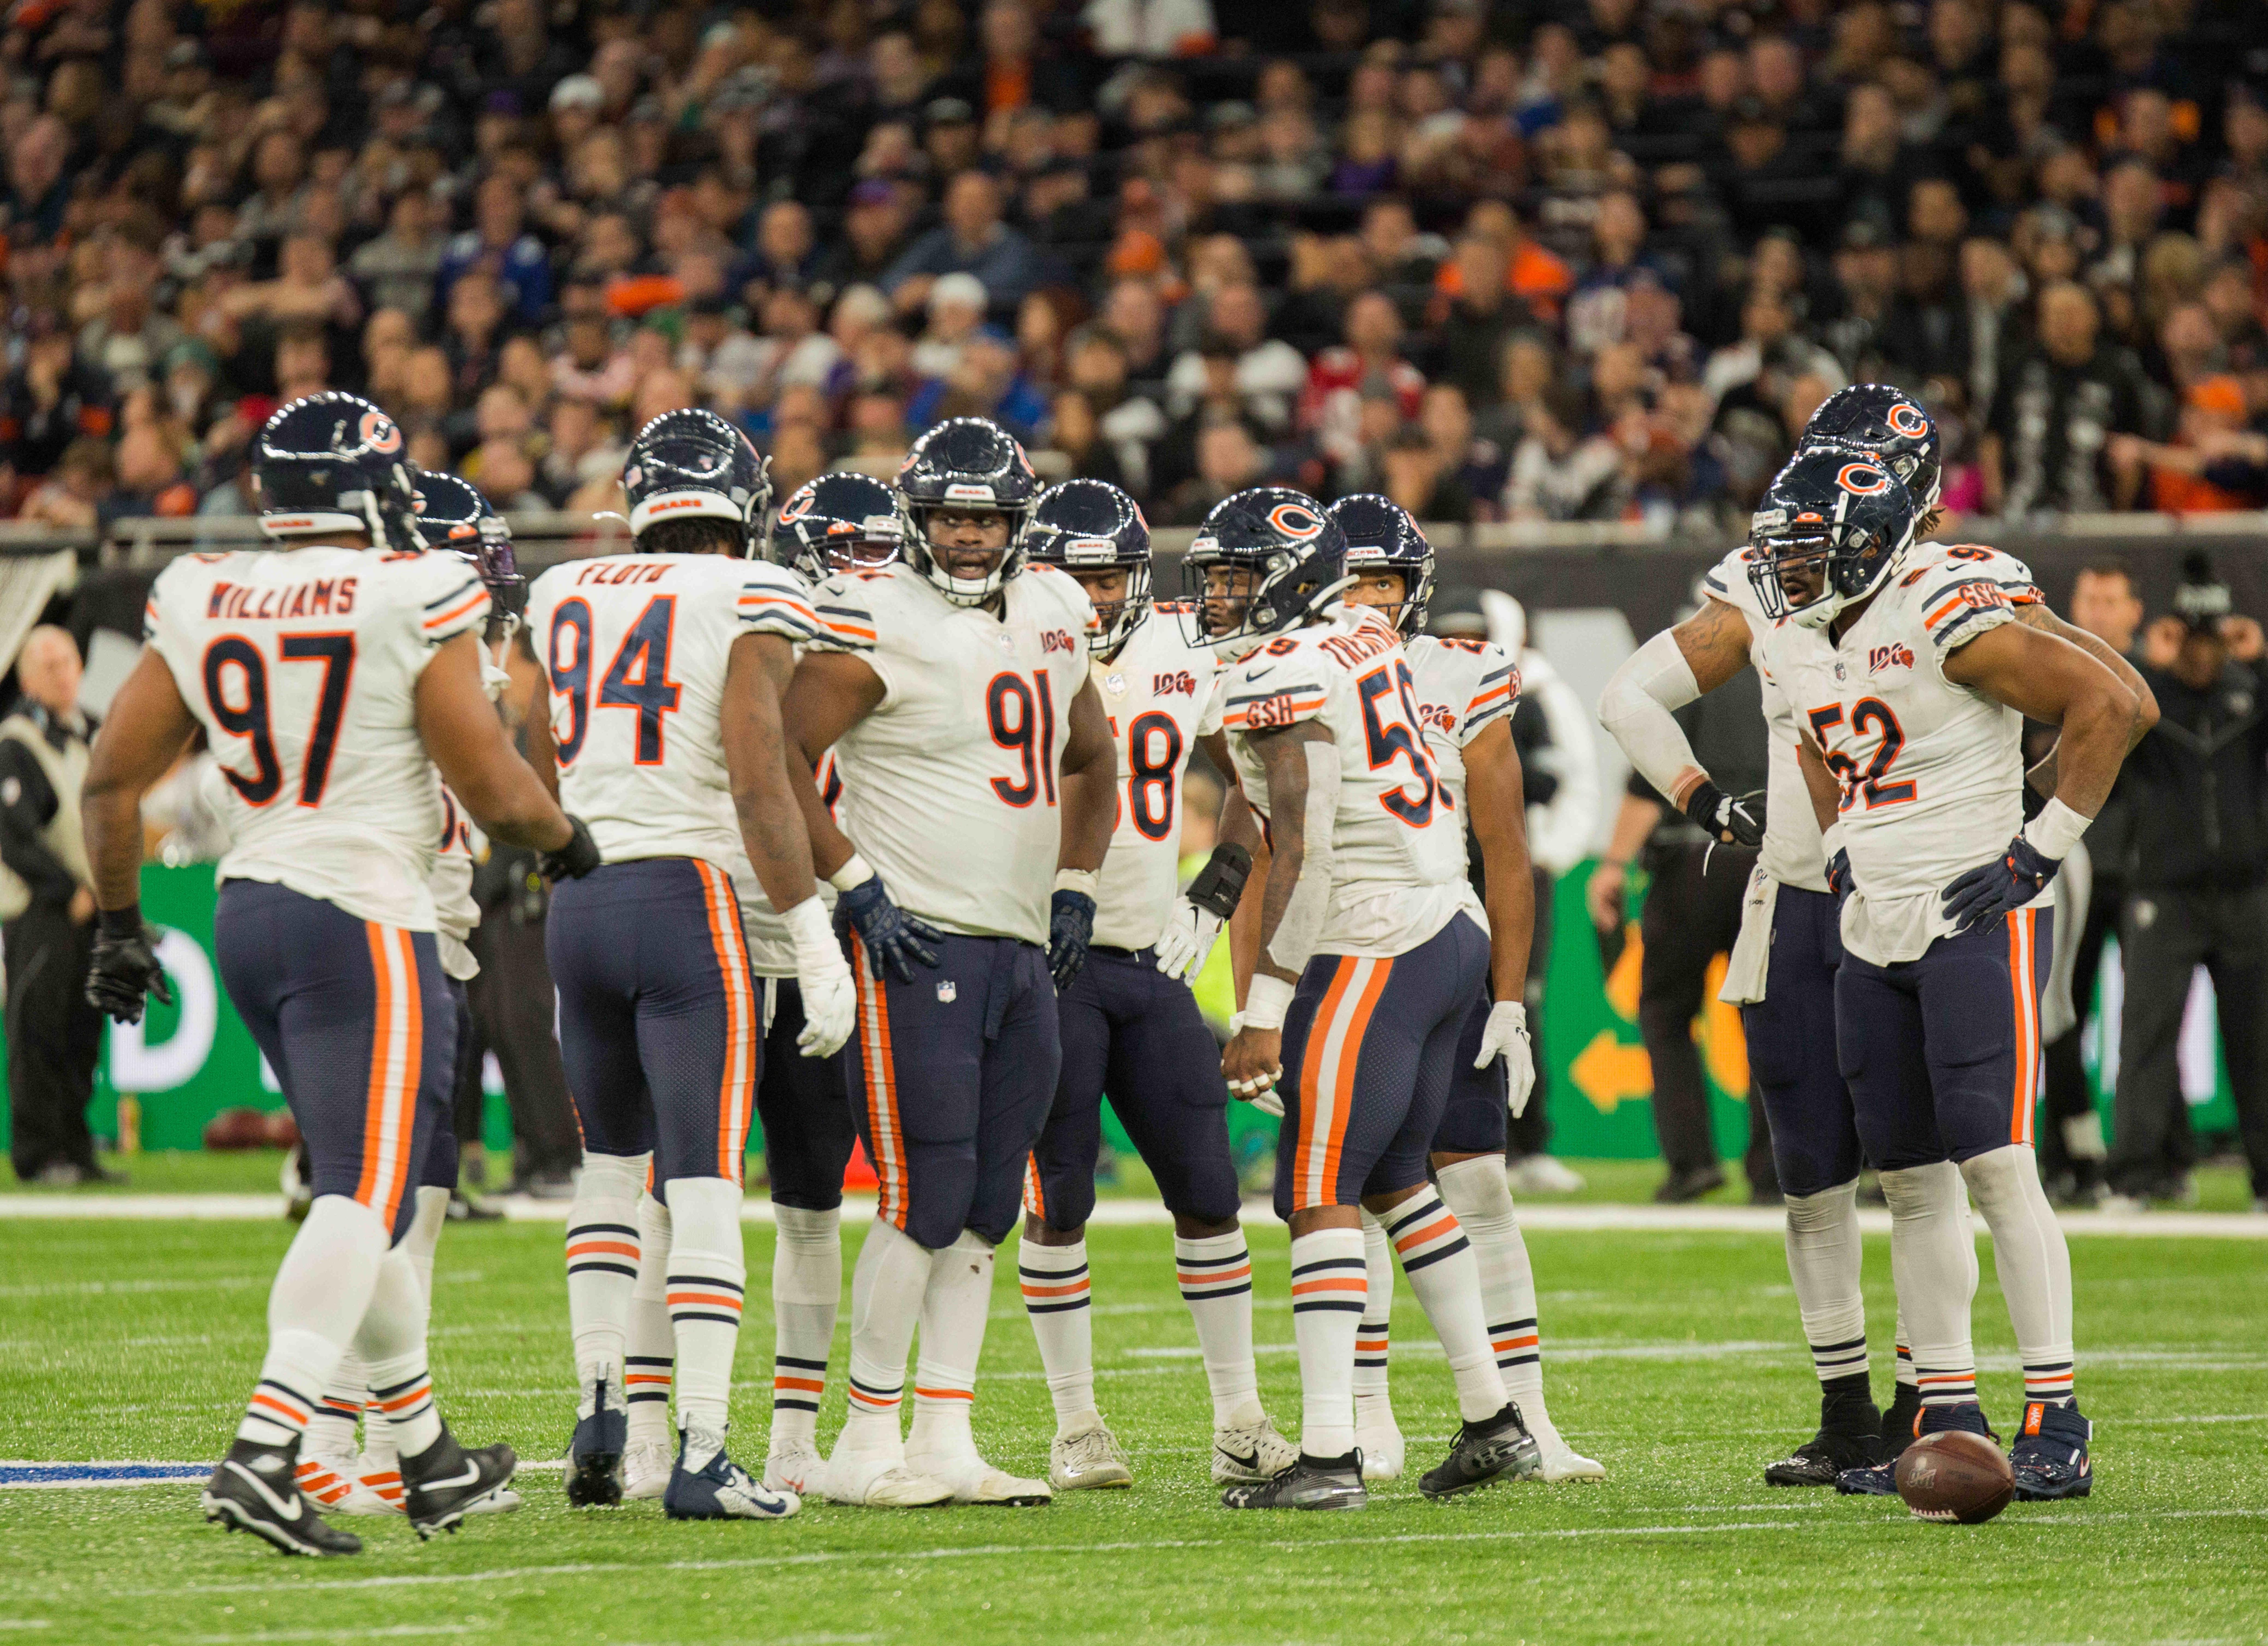 NFL: OCT 06 Bears v Raiders